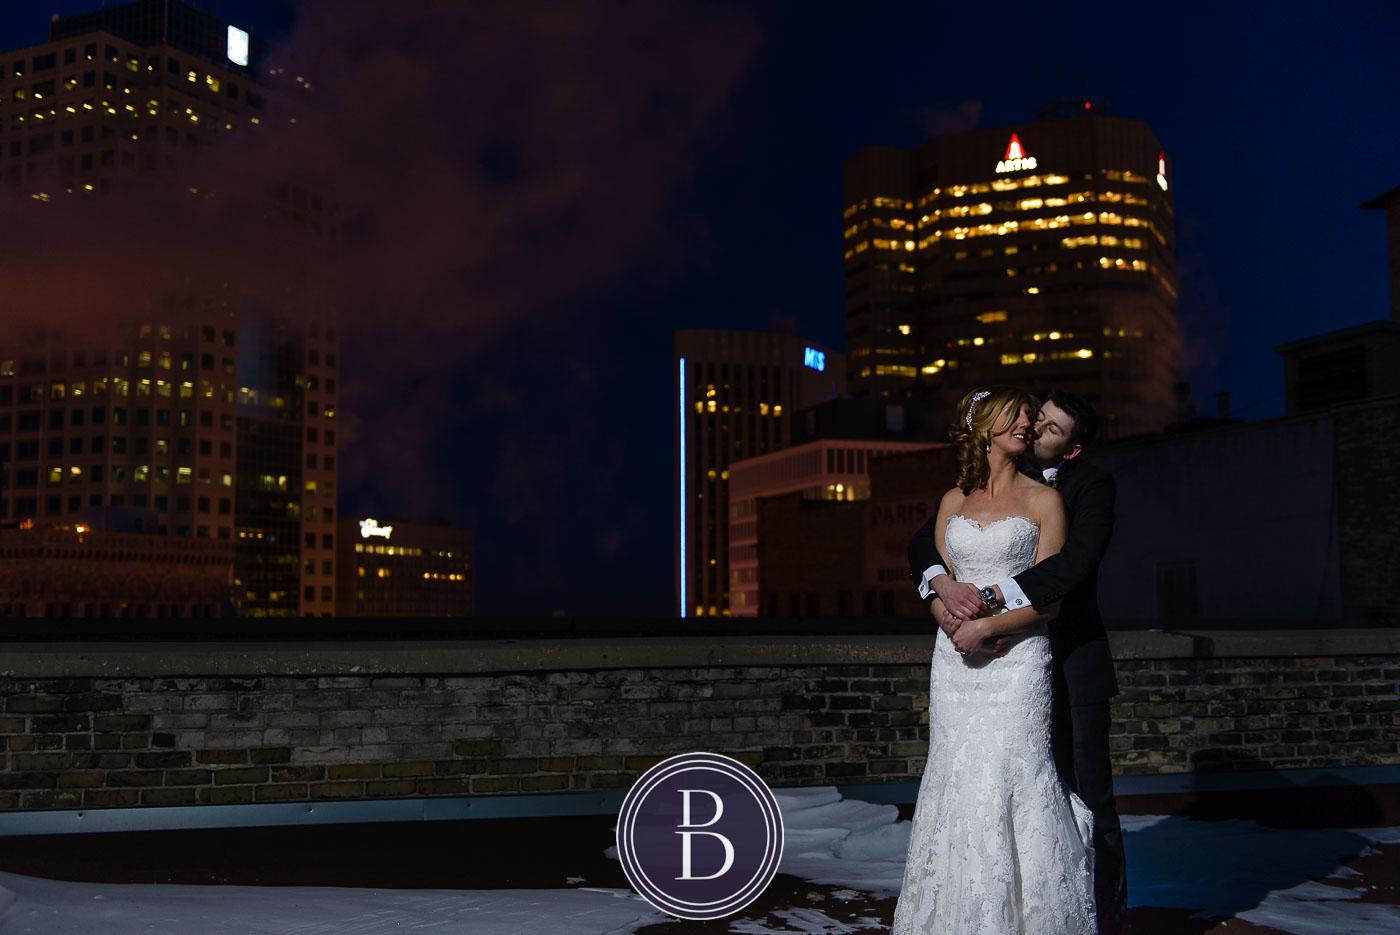 winnipeg winter wedding rooftop Marlborough Hotel bride and groom